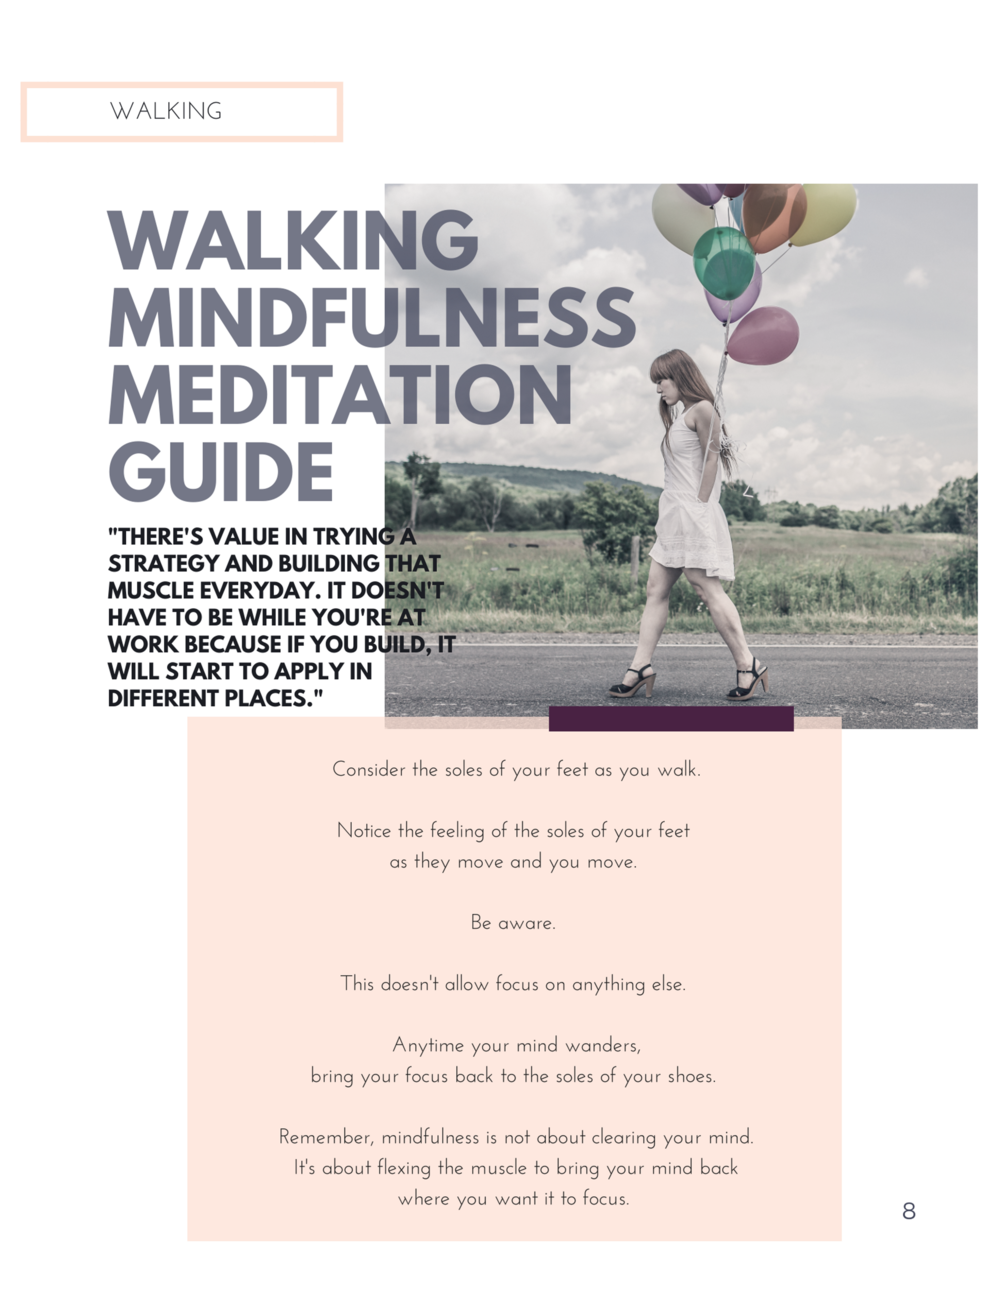 MindfulnessMastermindGuide-WalkingMeditationexcerpt.png